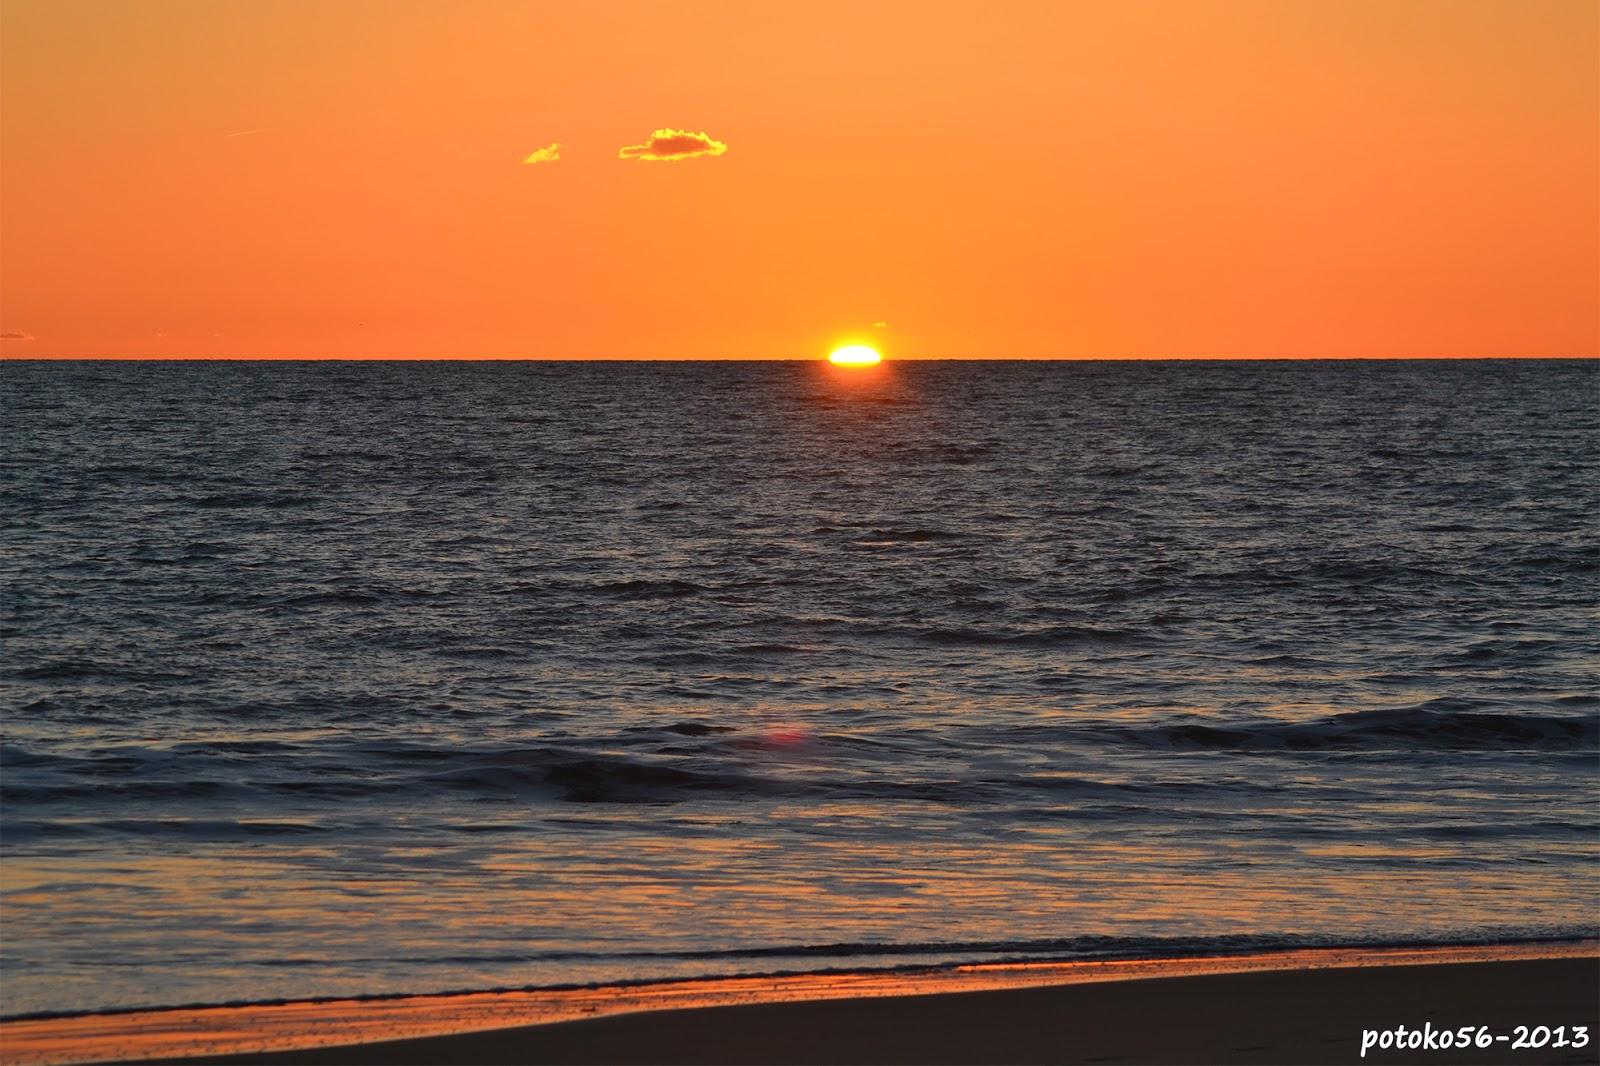 Nube Solitaria Puesta de Sol Rota